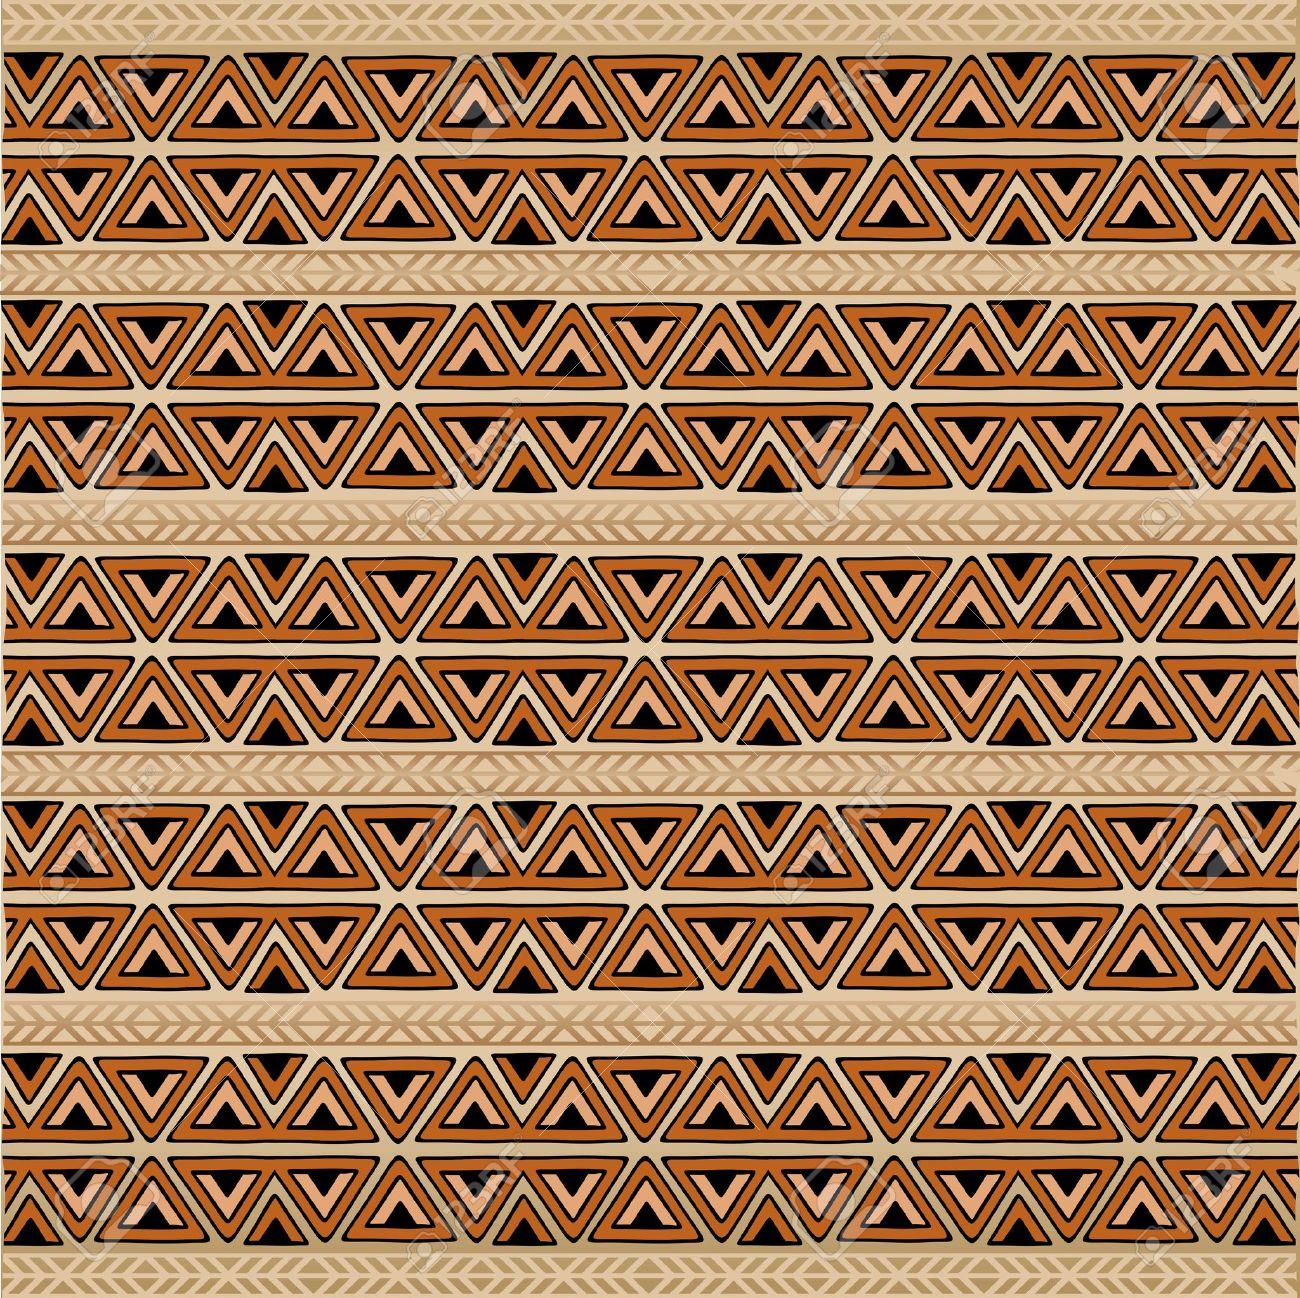 Africa Ethnic Art Pattern Texture Background Stock Vector - 19872109